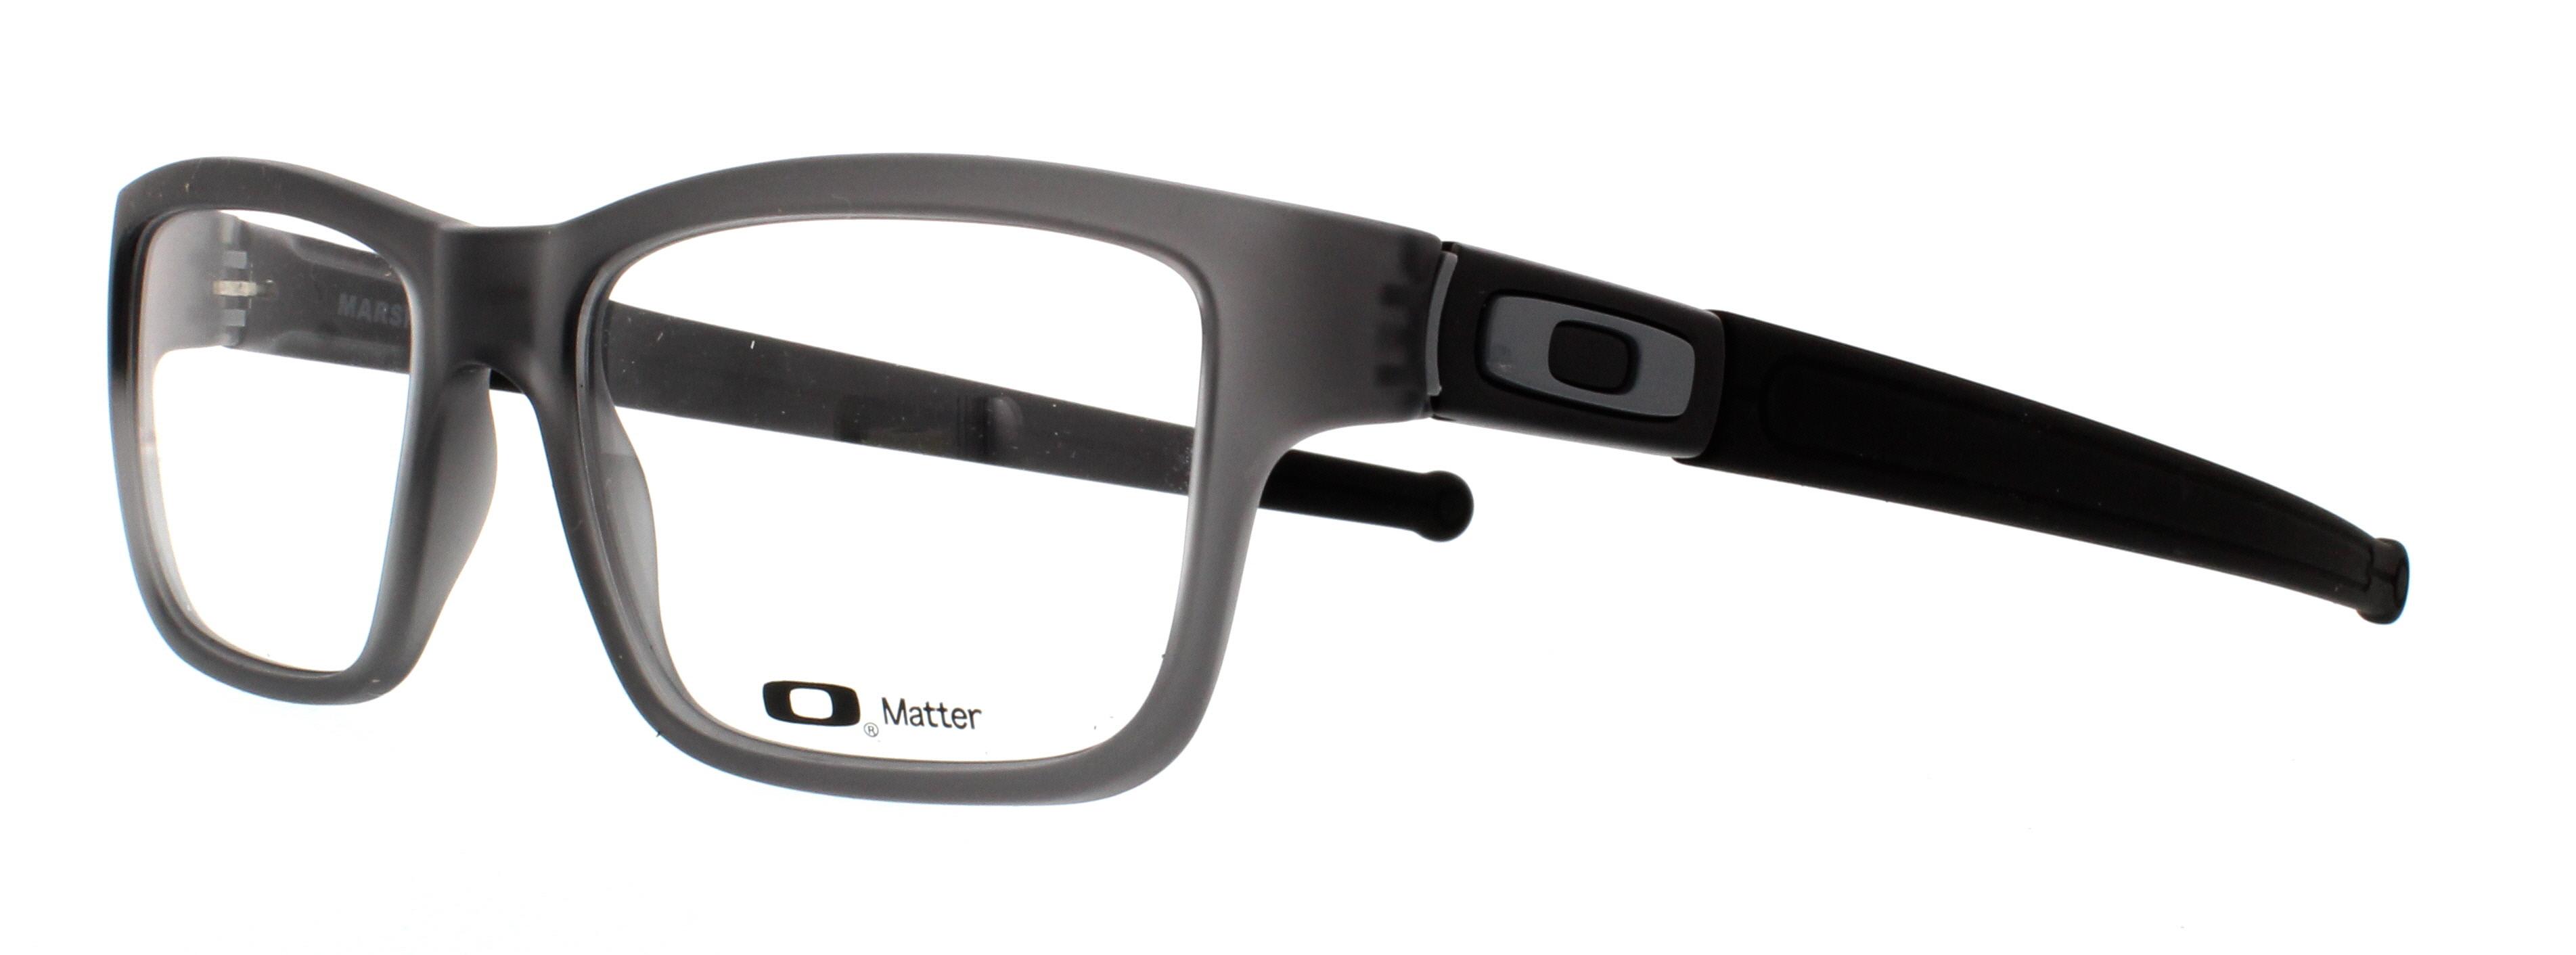 963745c5043 best oakley sunglasses marshal 53 mens satin black frame no b5a0f 547d9